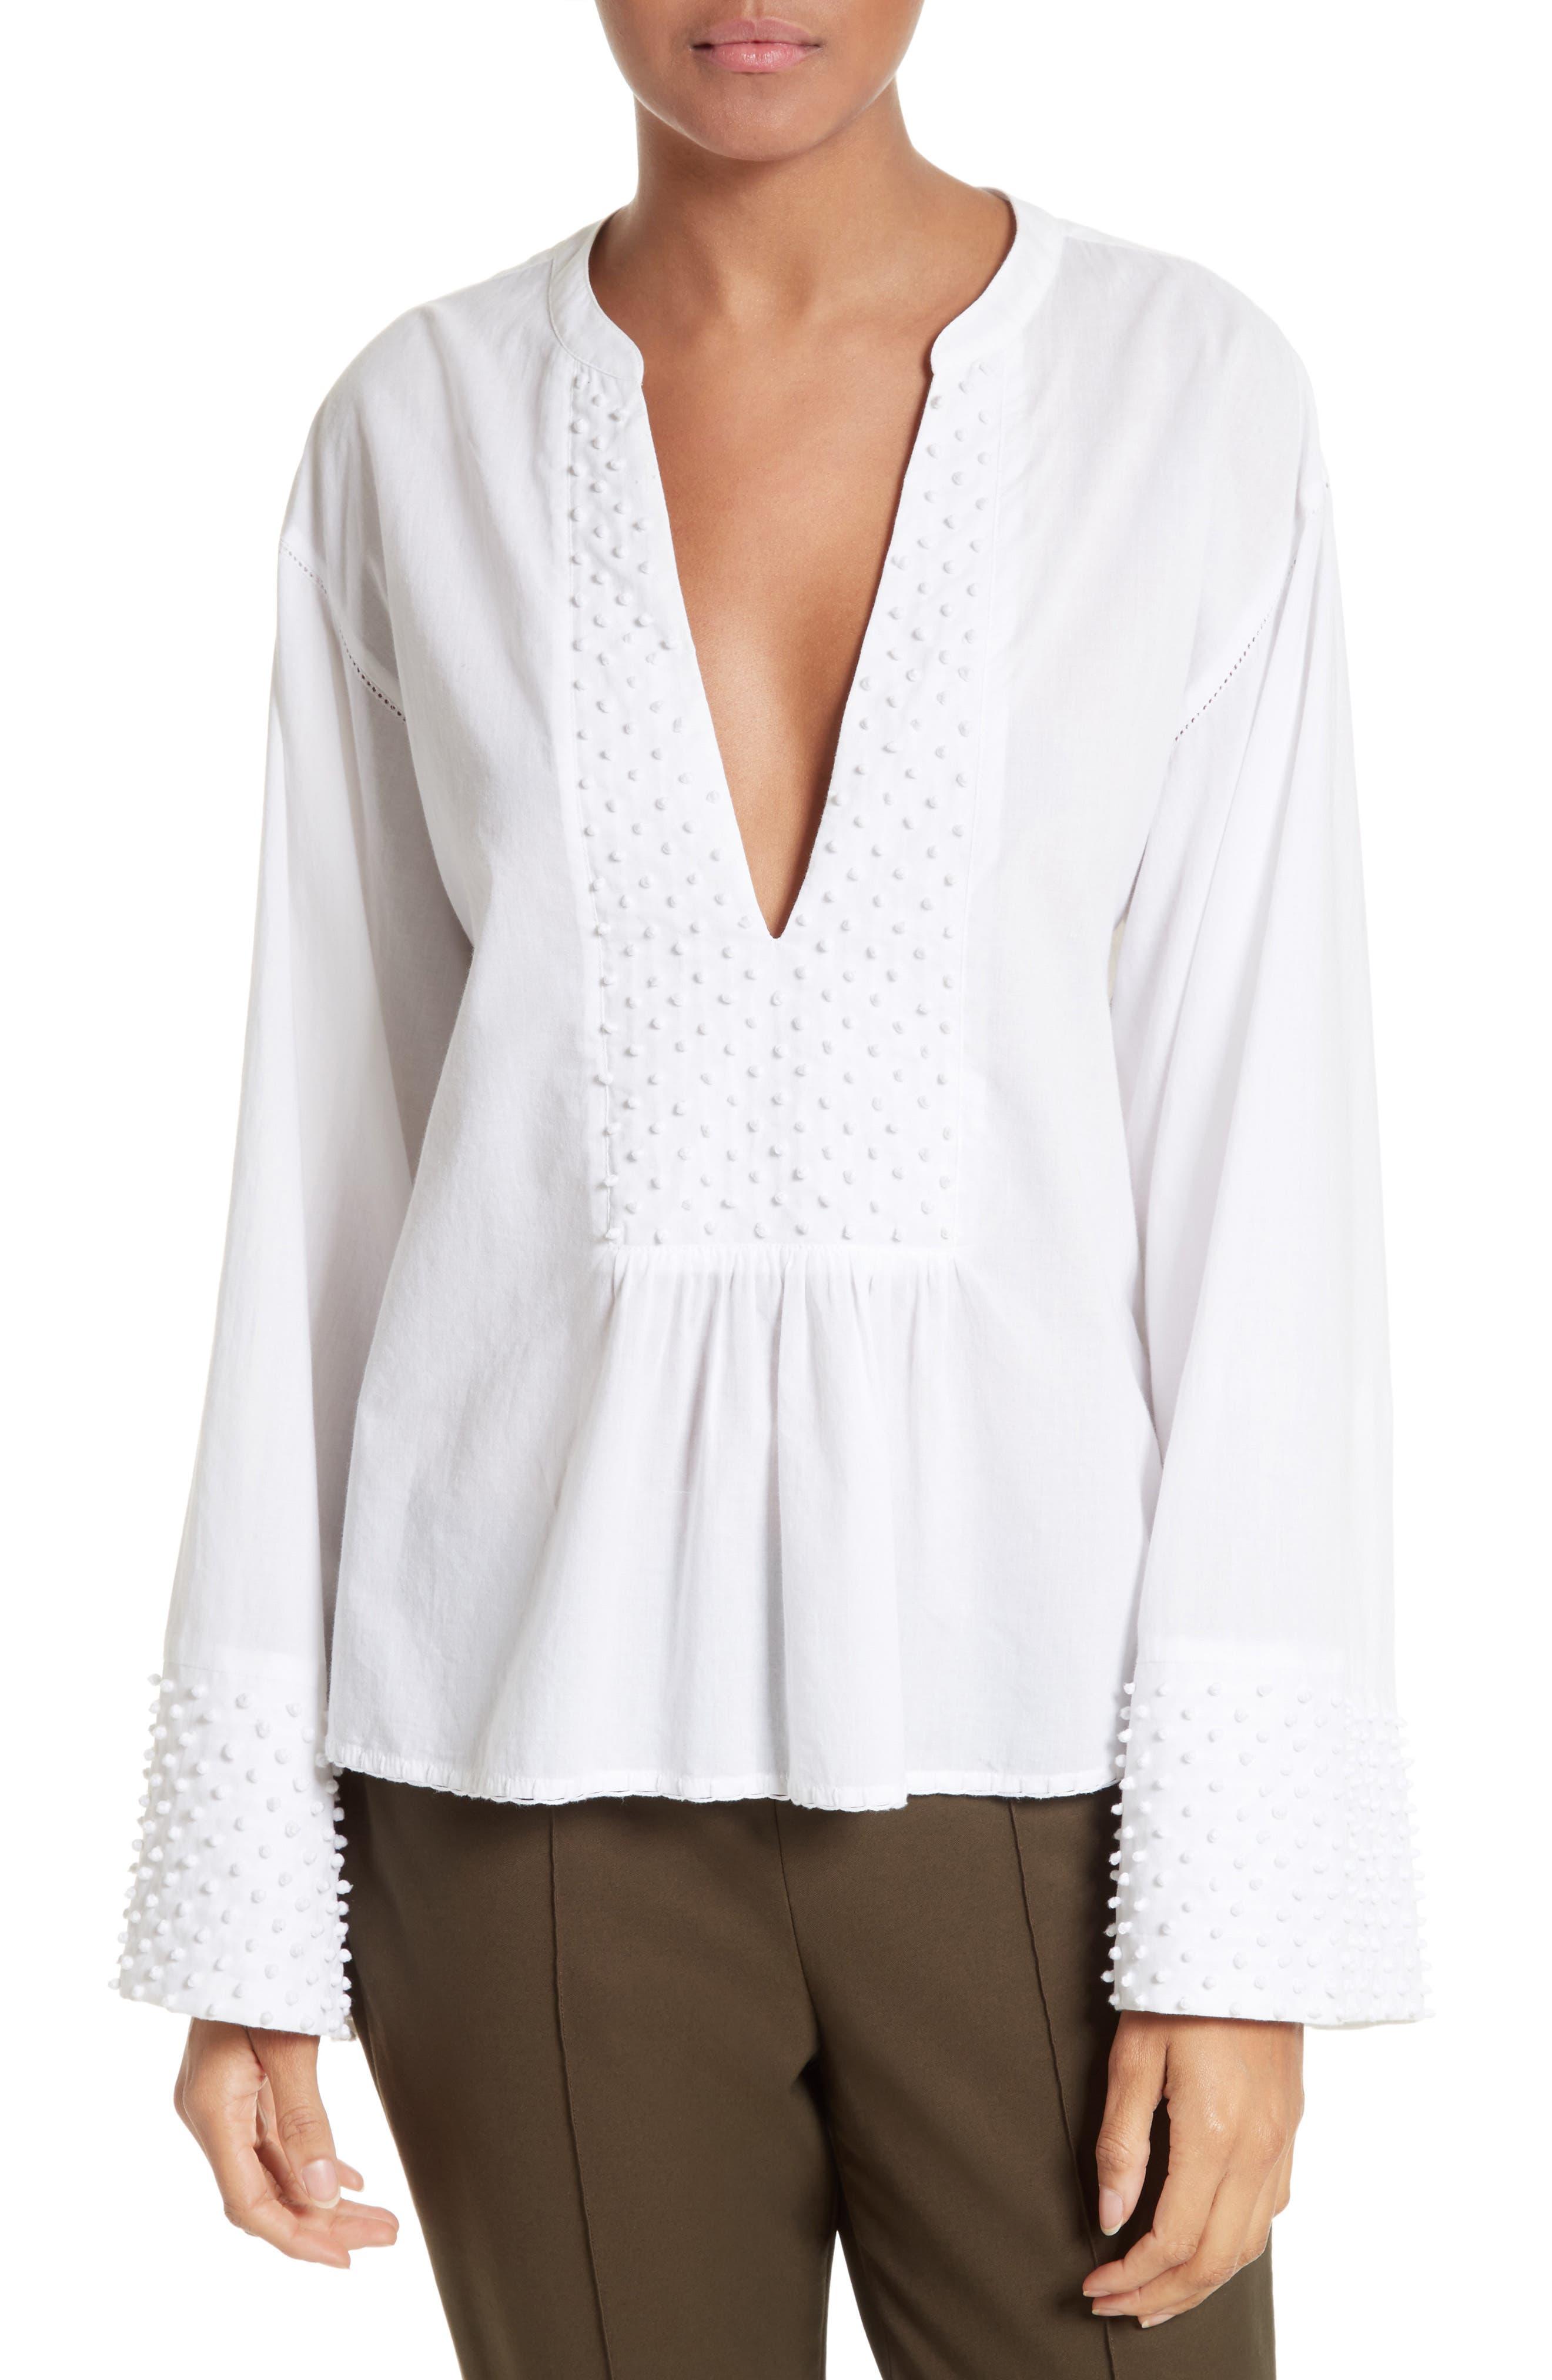 Main Image - Theory Matara E Embroidered Cotton Top